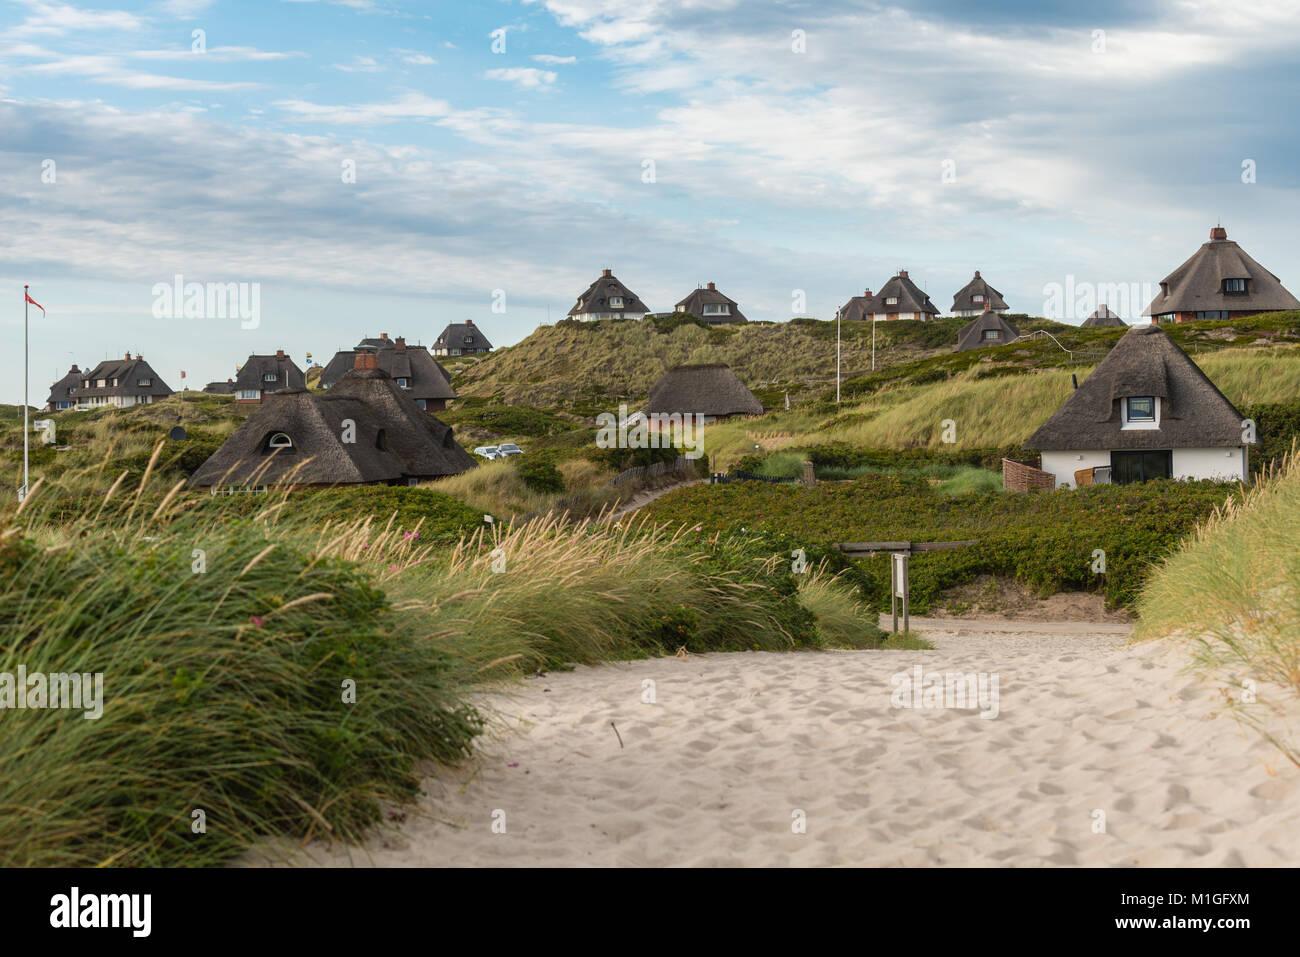 Ferienhaeuser in den Duenen vor Hoernum Odde, Hoernum, Sylt, Nordfriesland - Stock Image